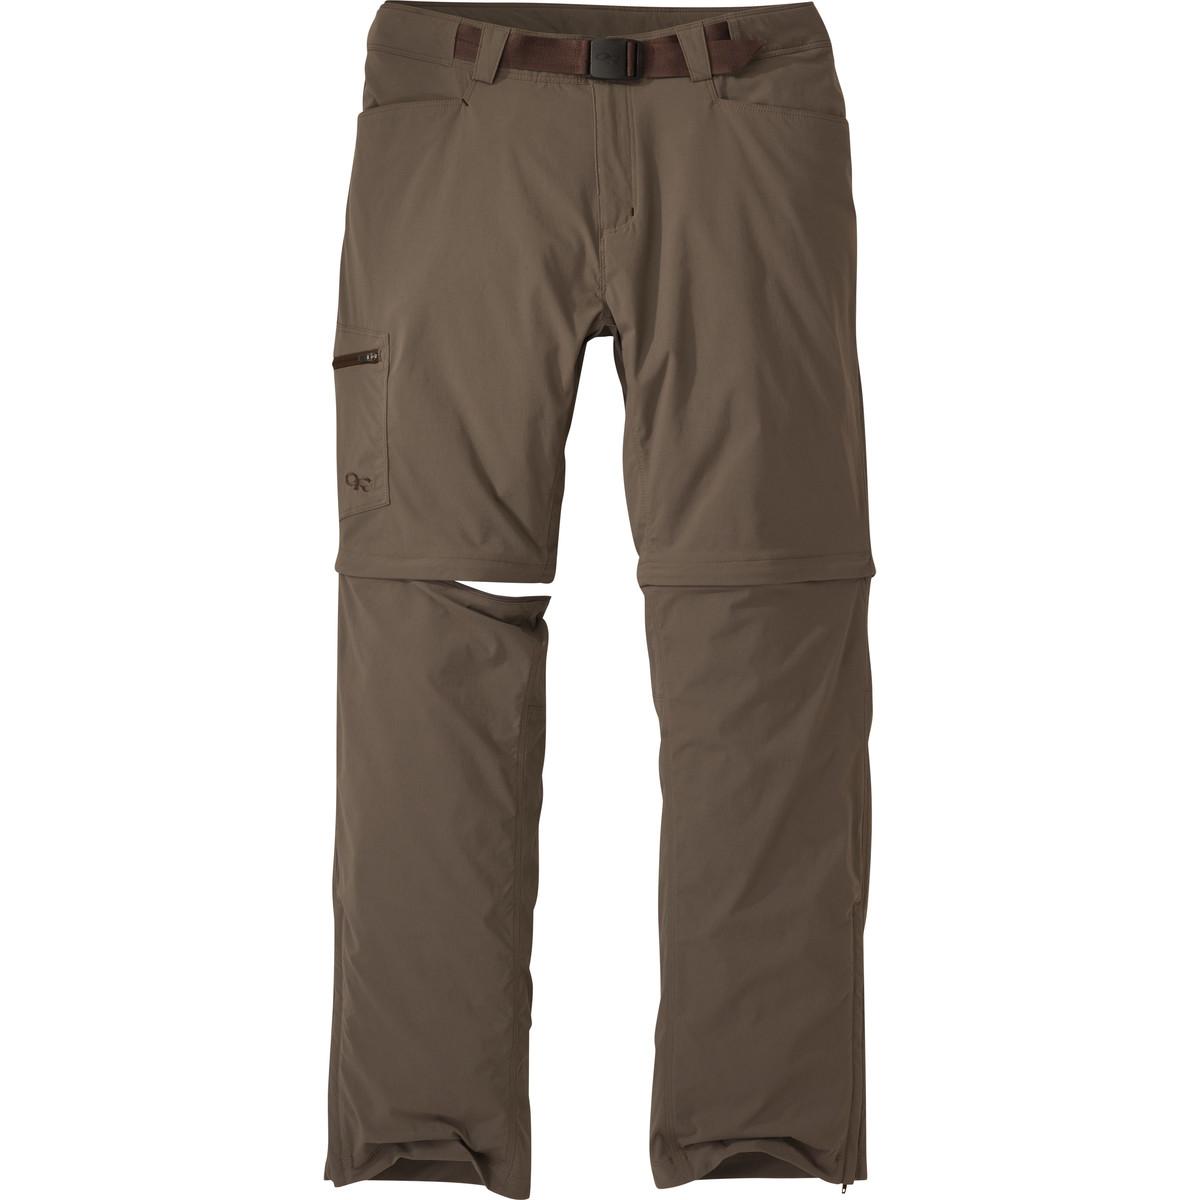 photo: Outdoor Research Men's Equinox Convert Pants hiking pant